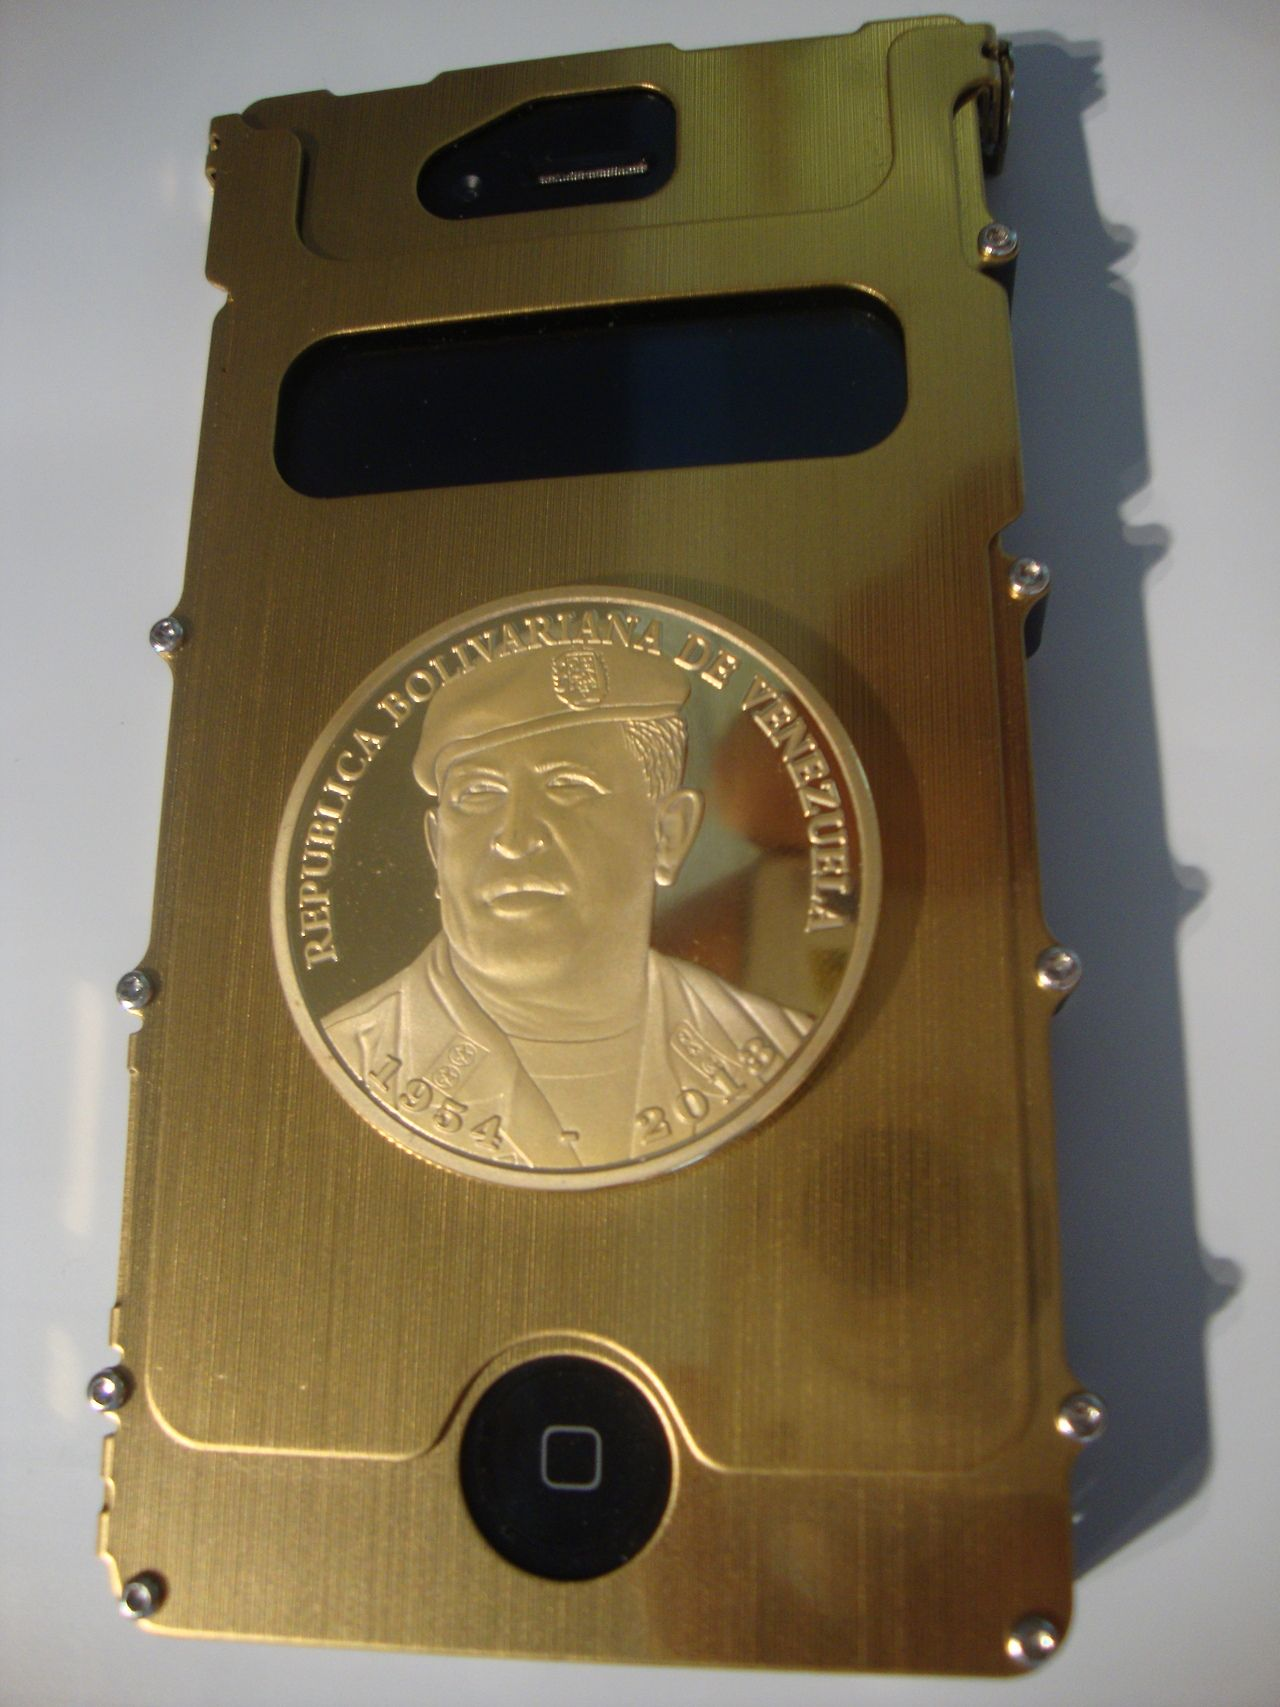 Venezuelan presidential iPhone gold case el...   VENEXILE NETWORKS